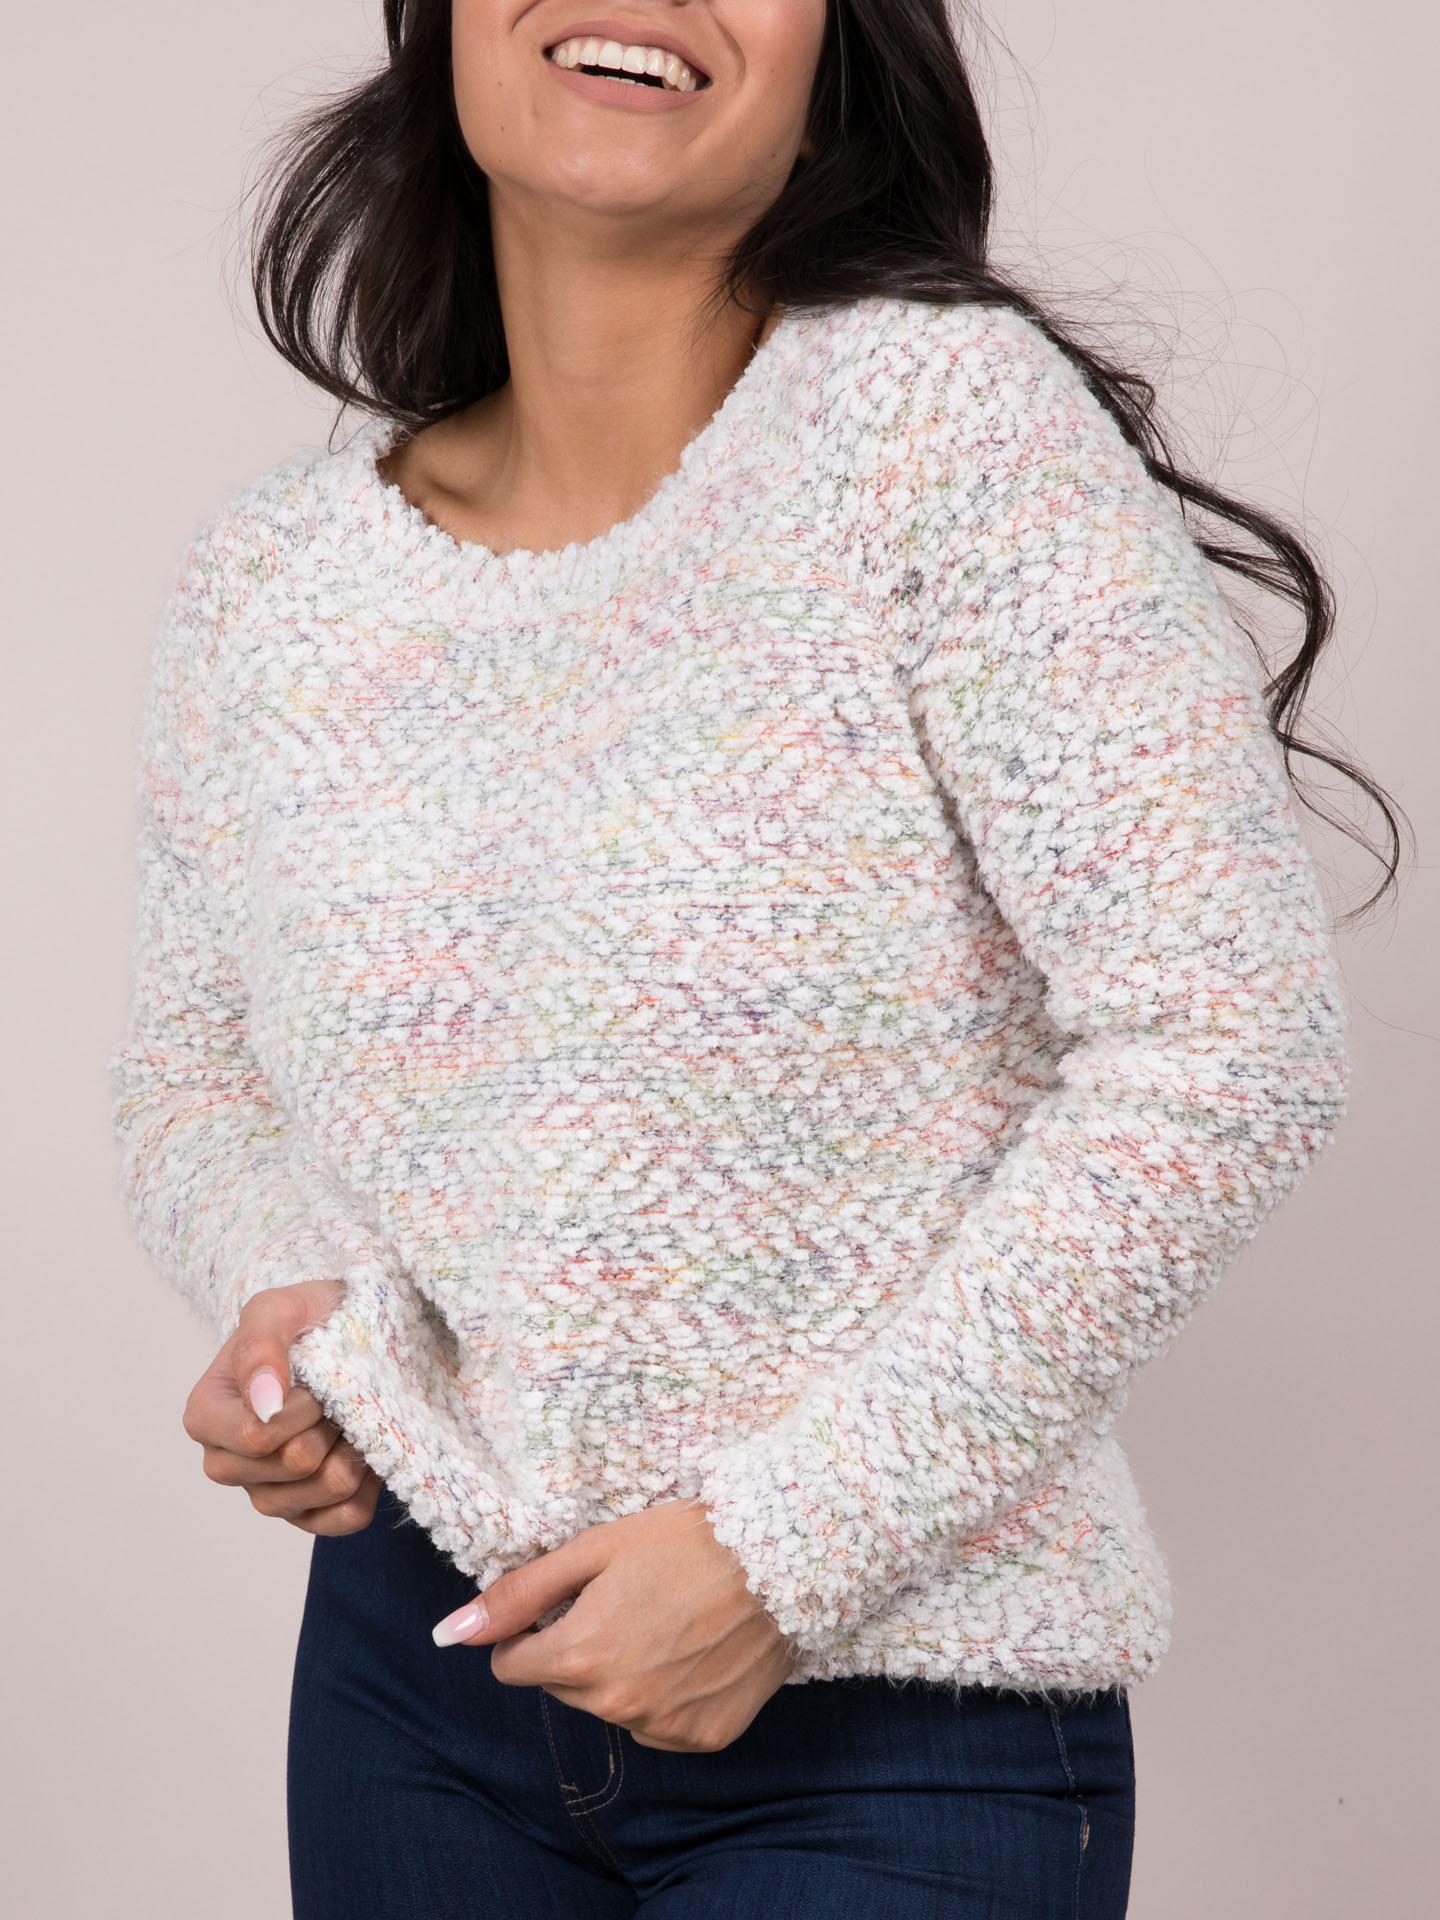 PopcornColor Sweater